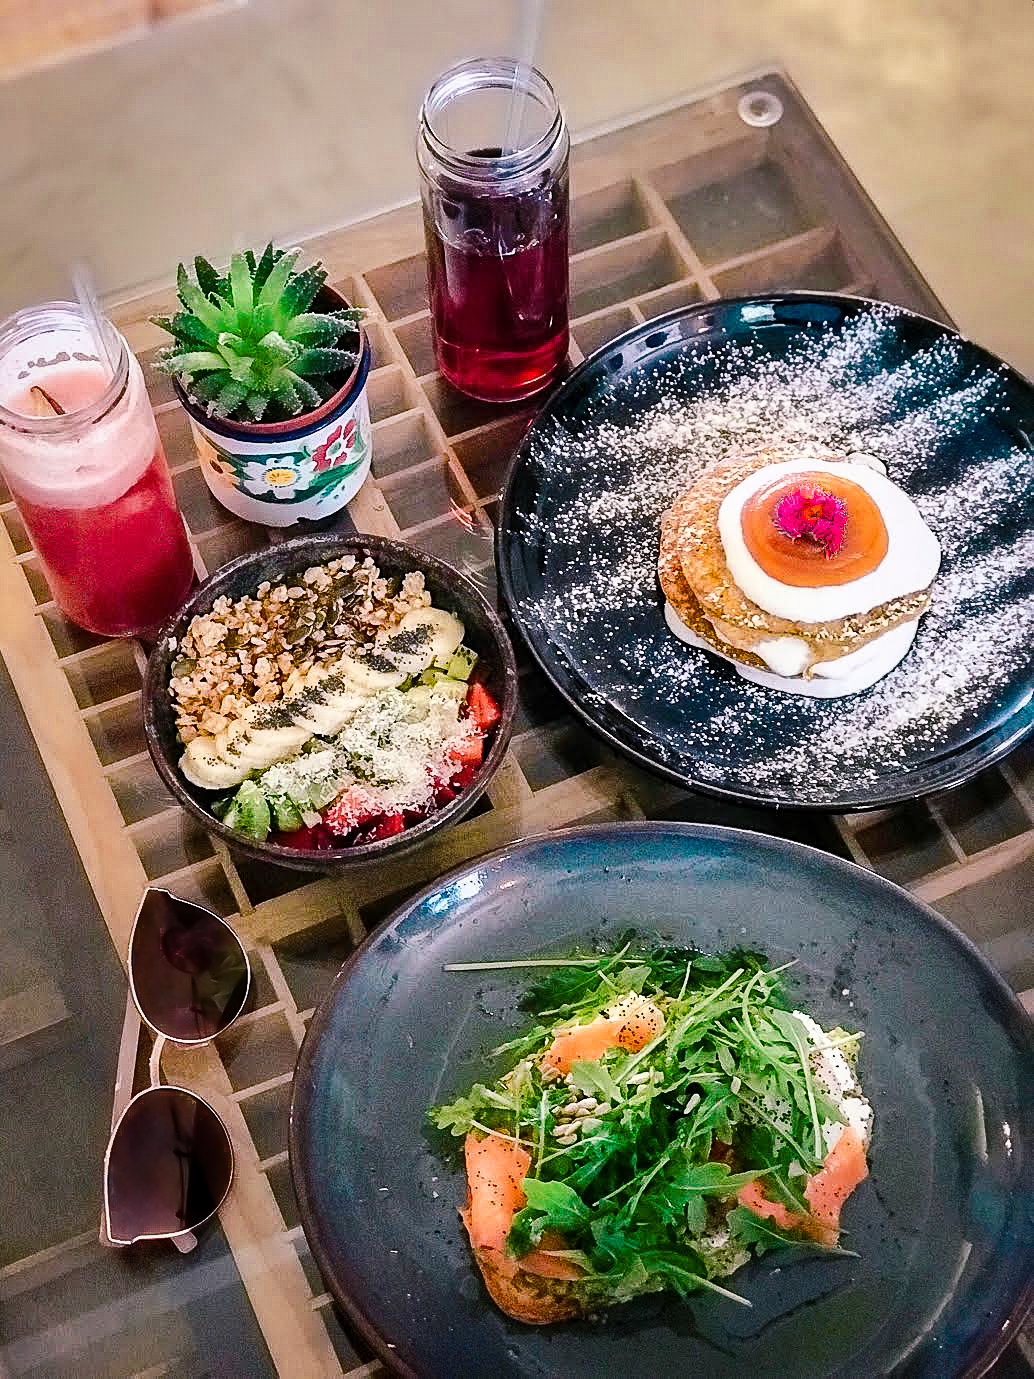 Muslim-travel-tips-Lisbon-recommendations-halal-brunch-restaurants